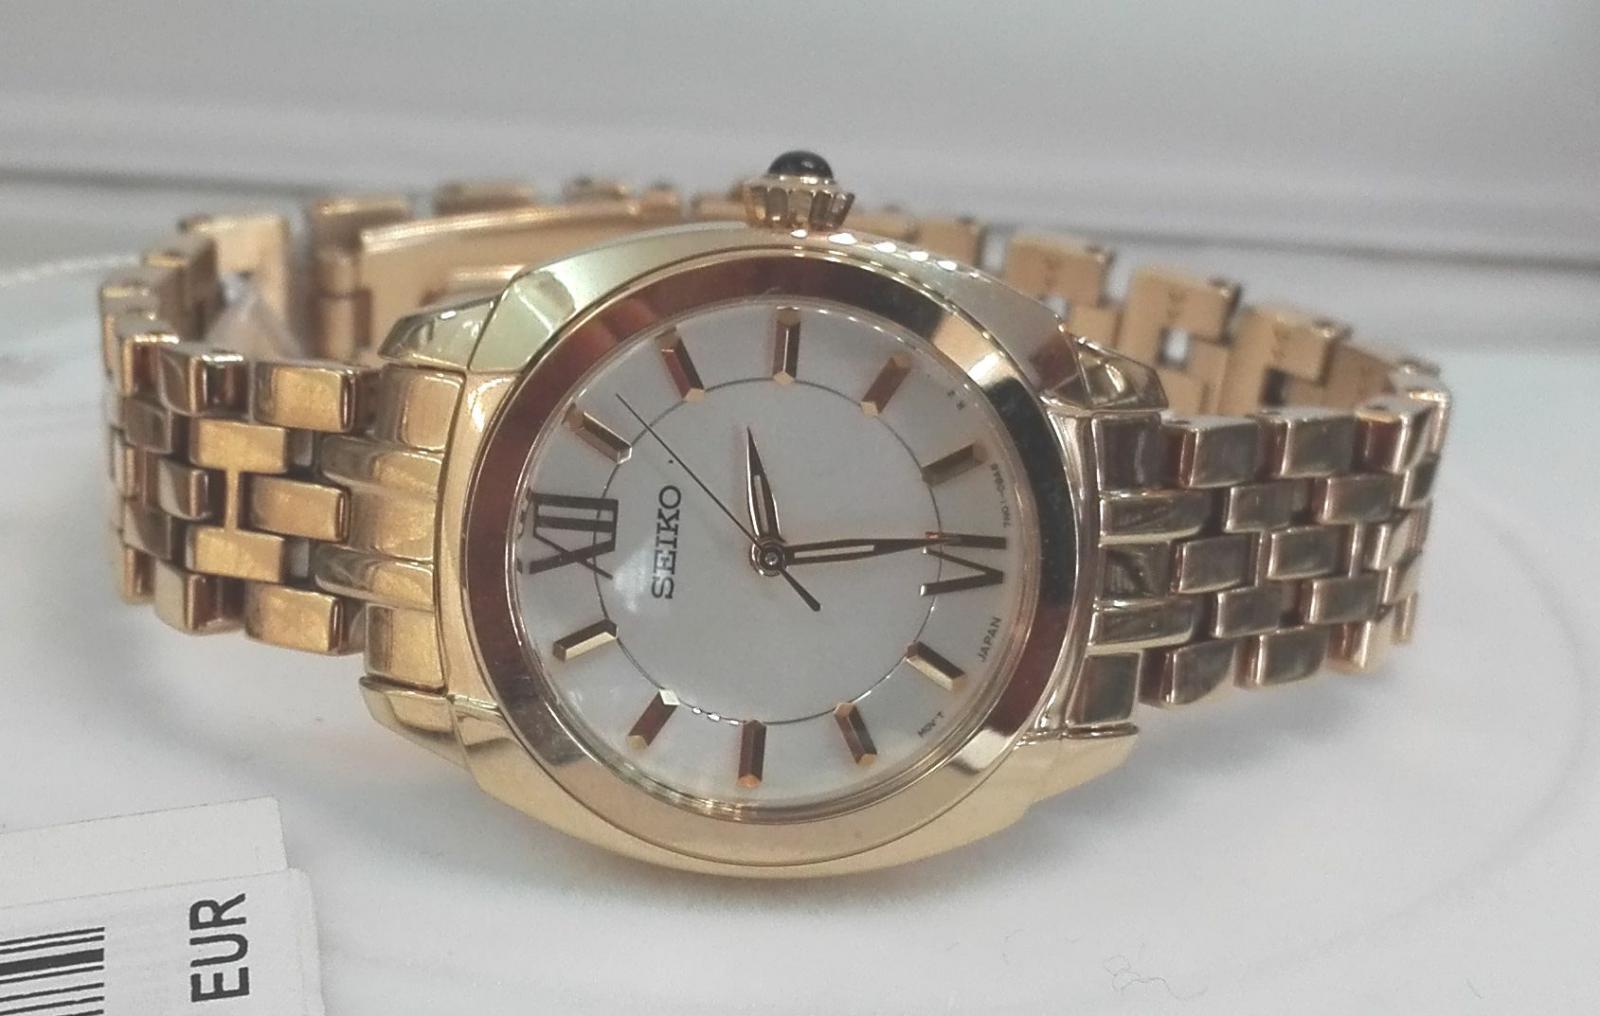 Reloj Seiko Colección Mujer SRZ428P1 Chapado Oro